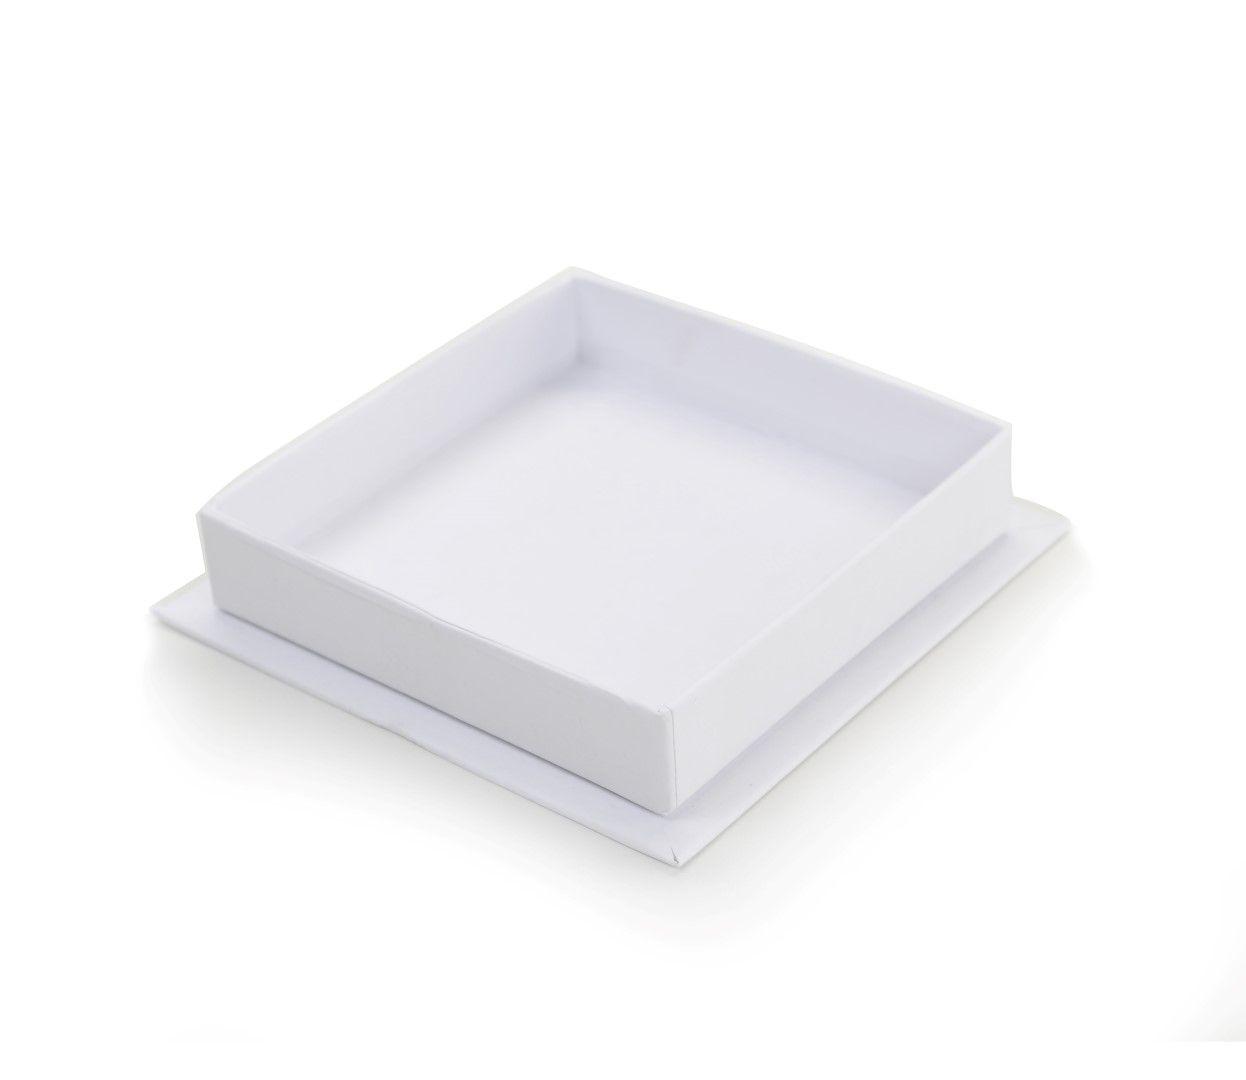 F108 Plus - Fundo - 10x10x2 cm - Branca